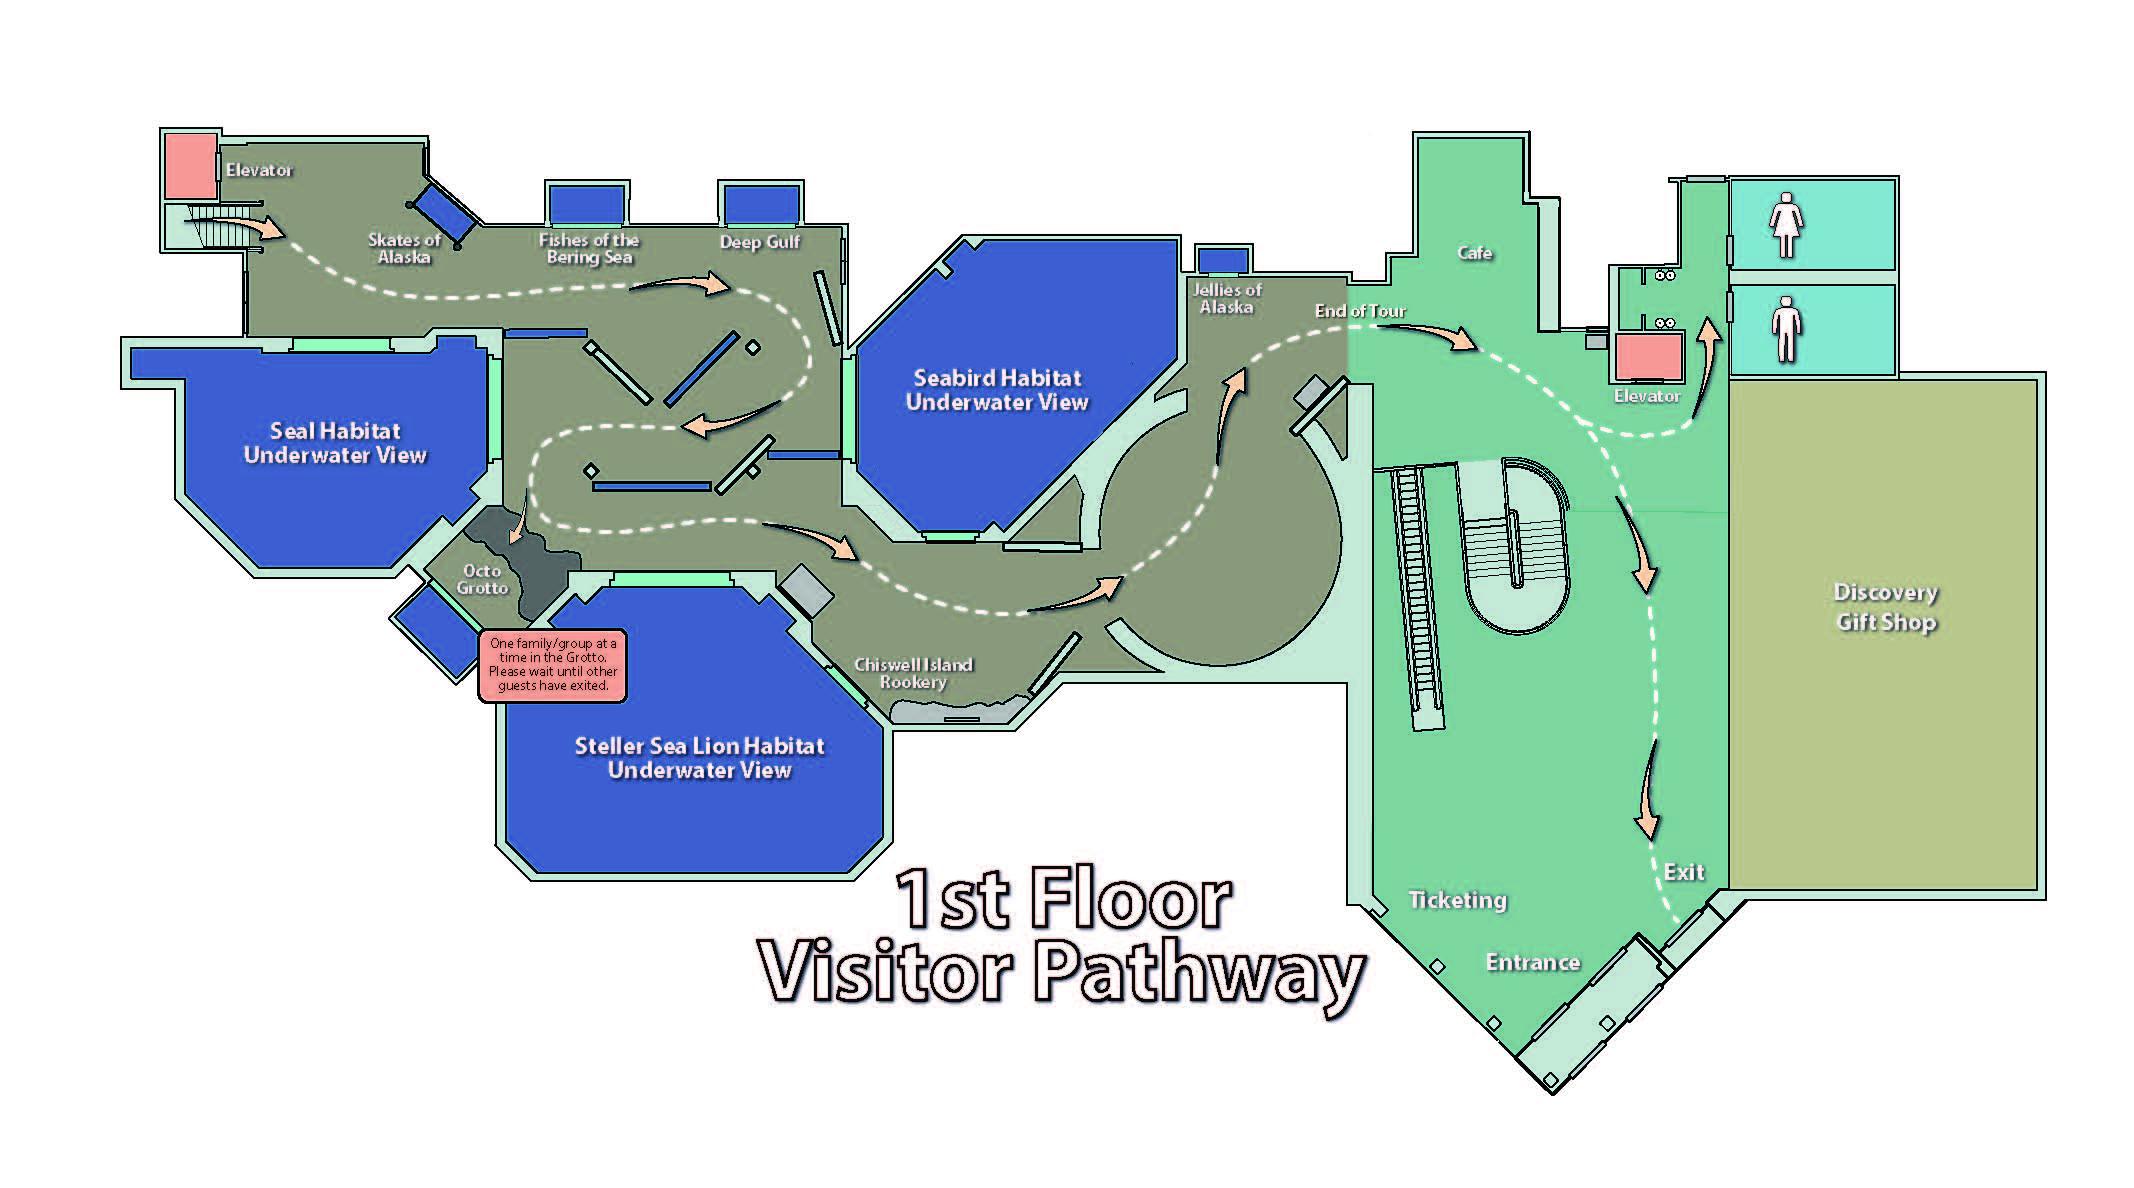 1st Floor Visitor Pathway